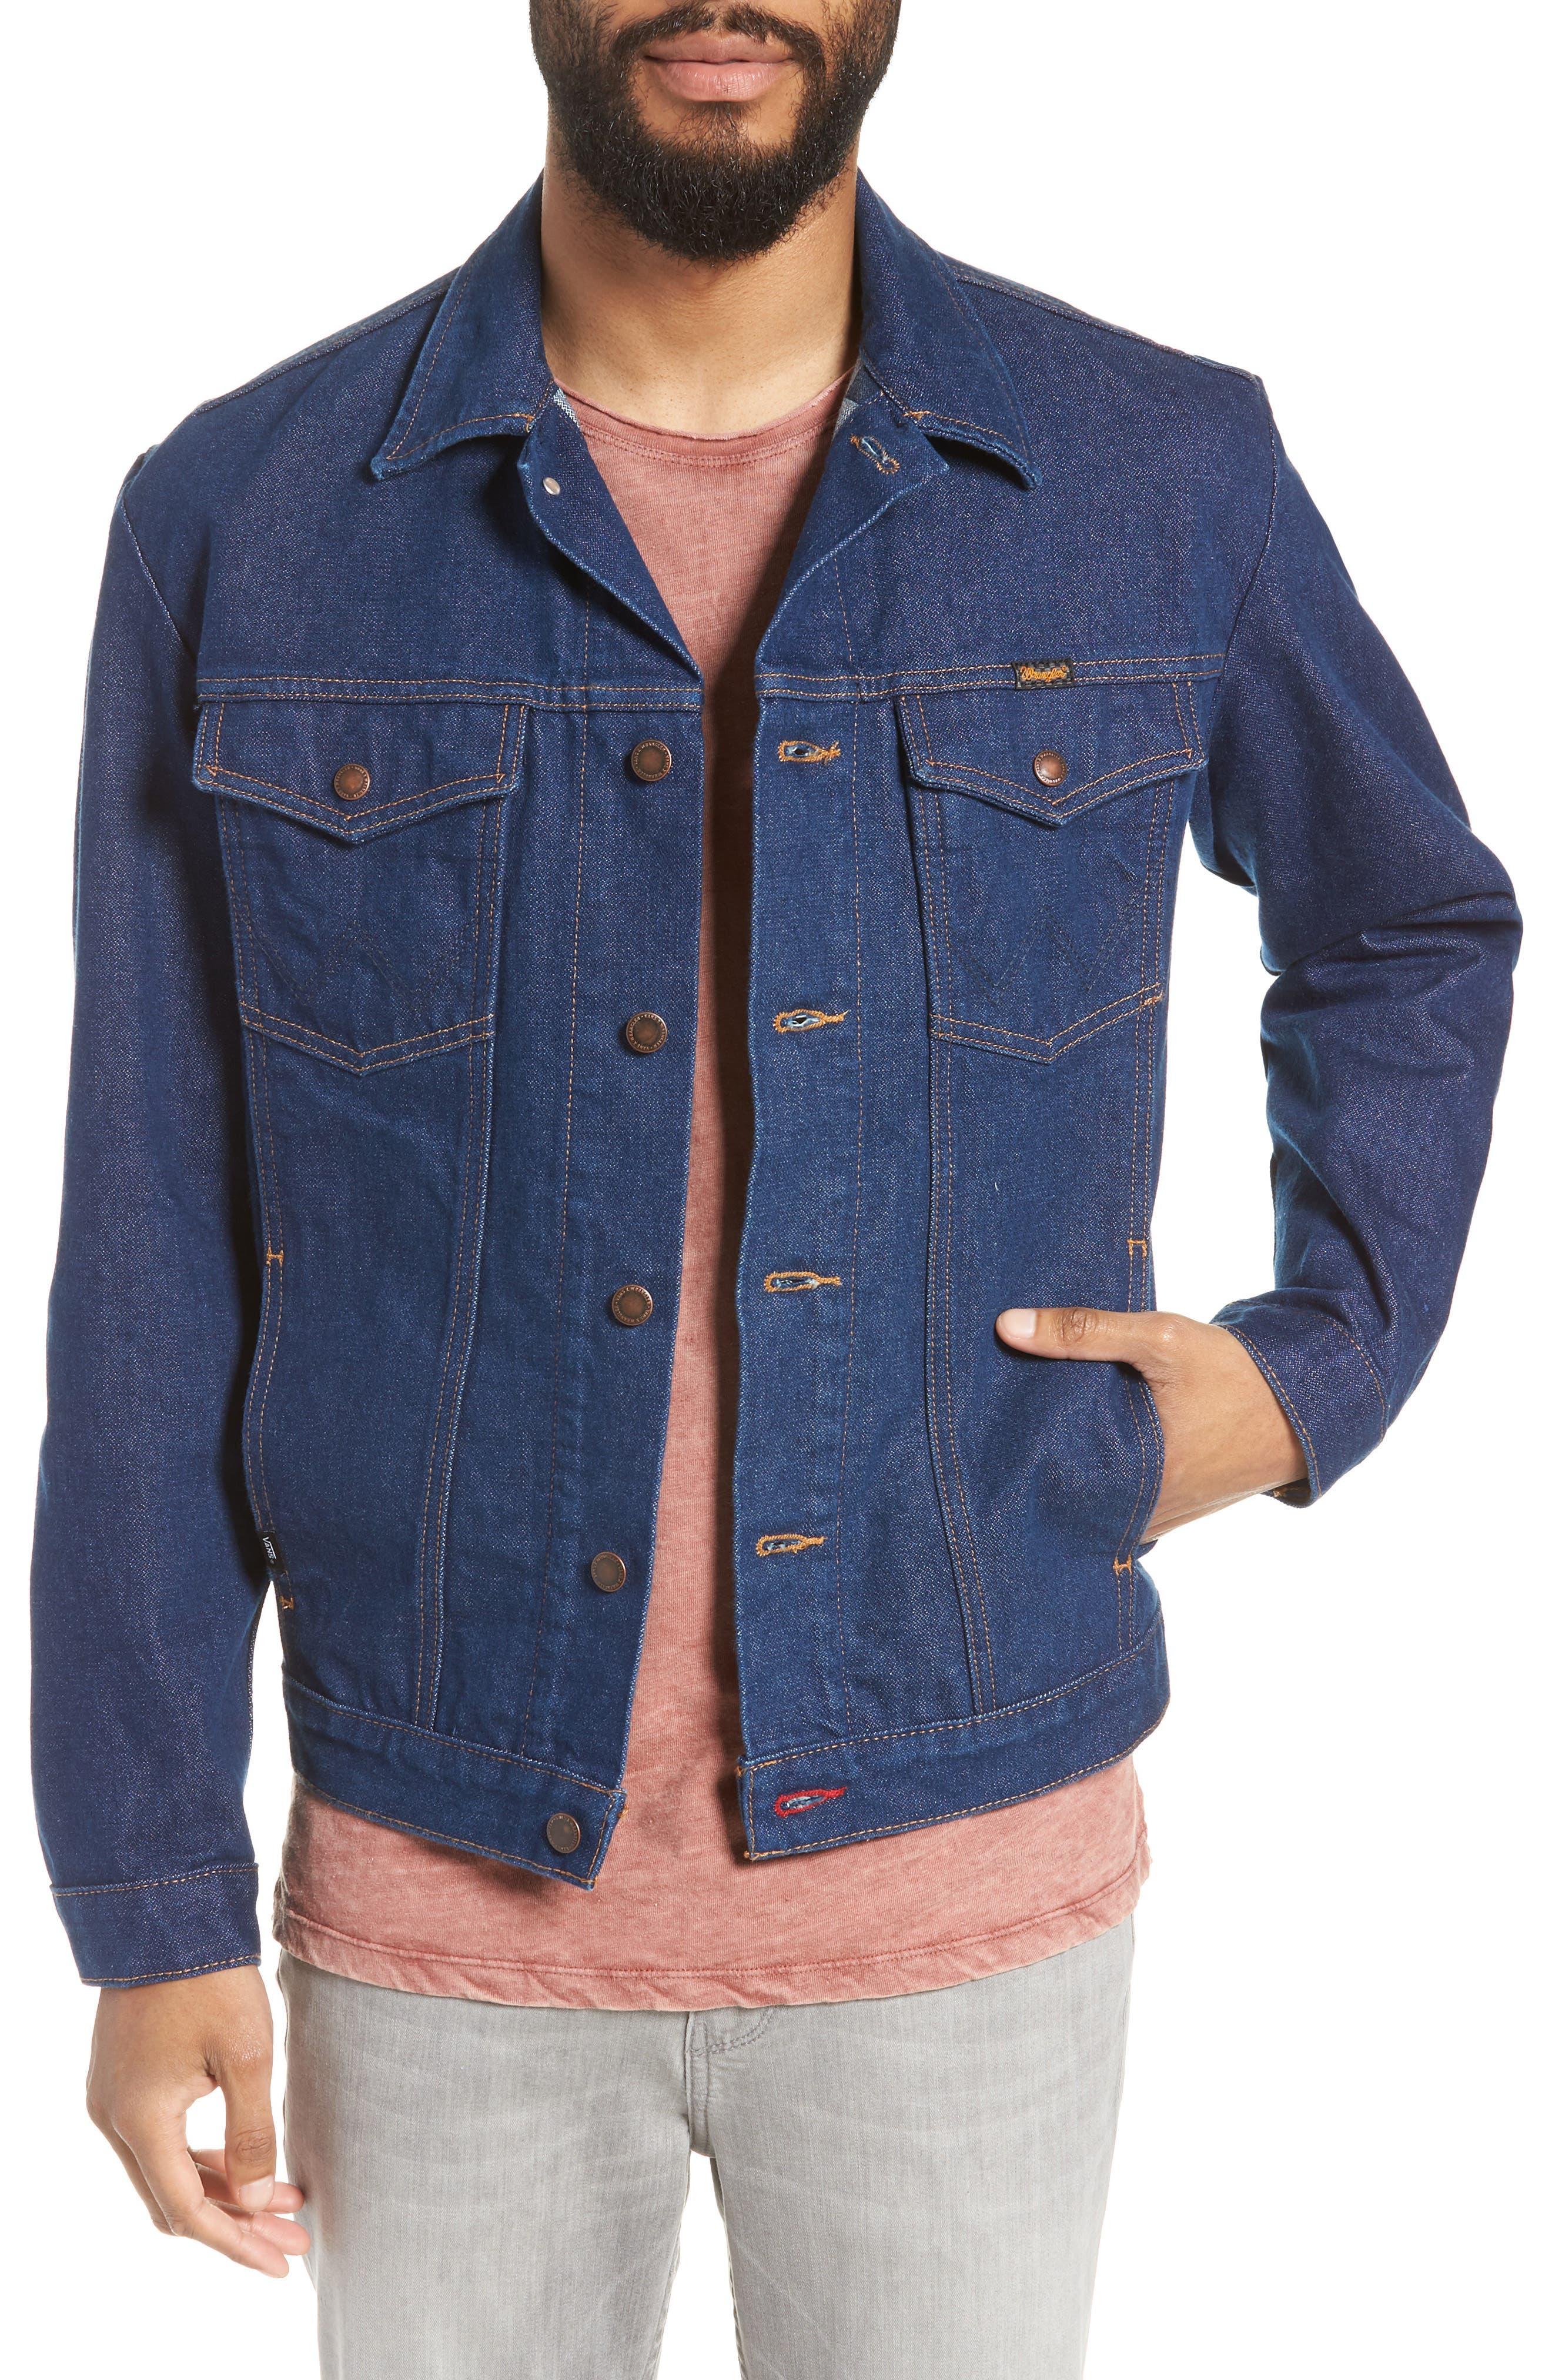 x Wrangler Denim Jacket,                         Main,                         color, 401